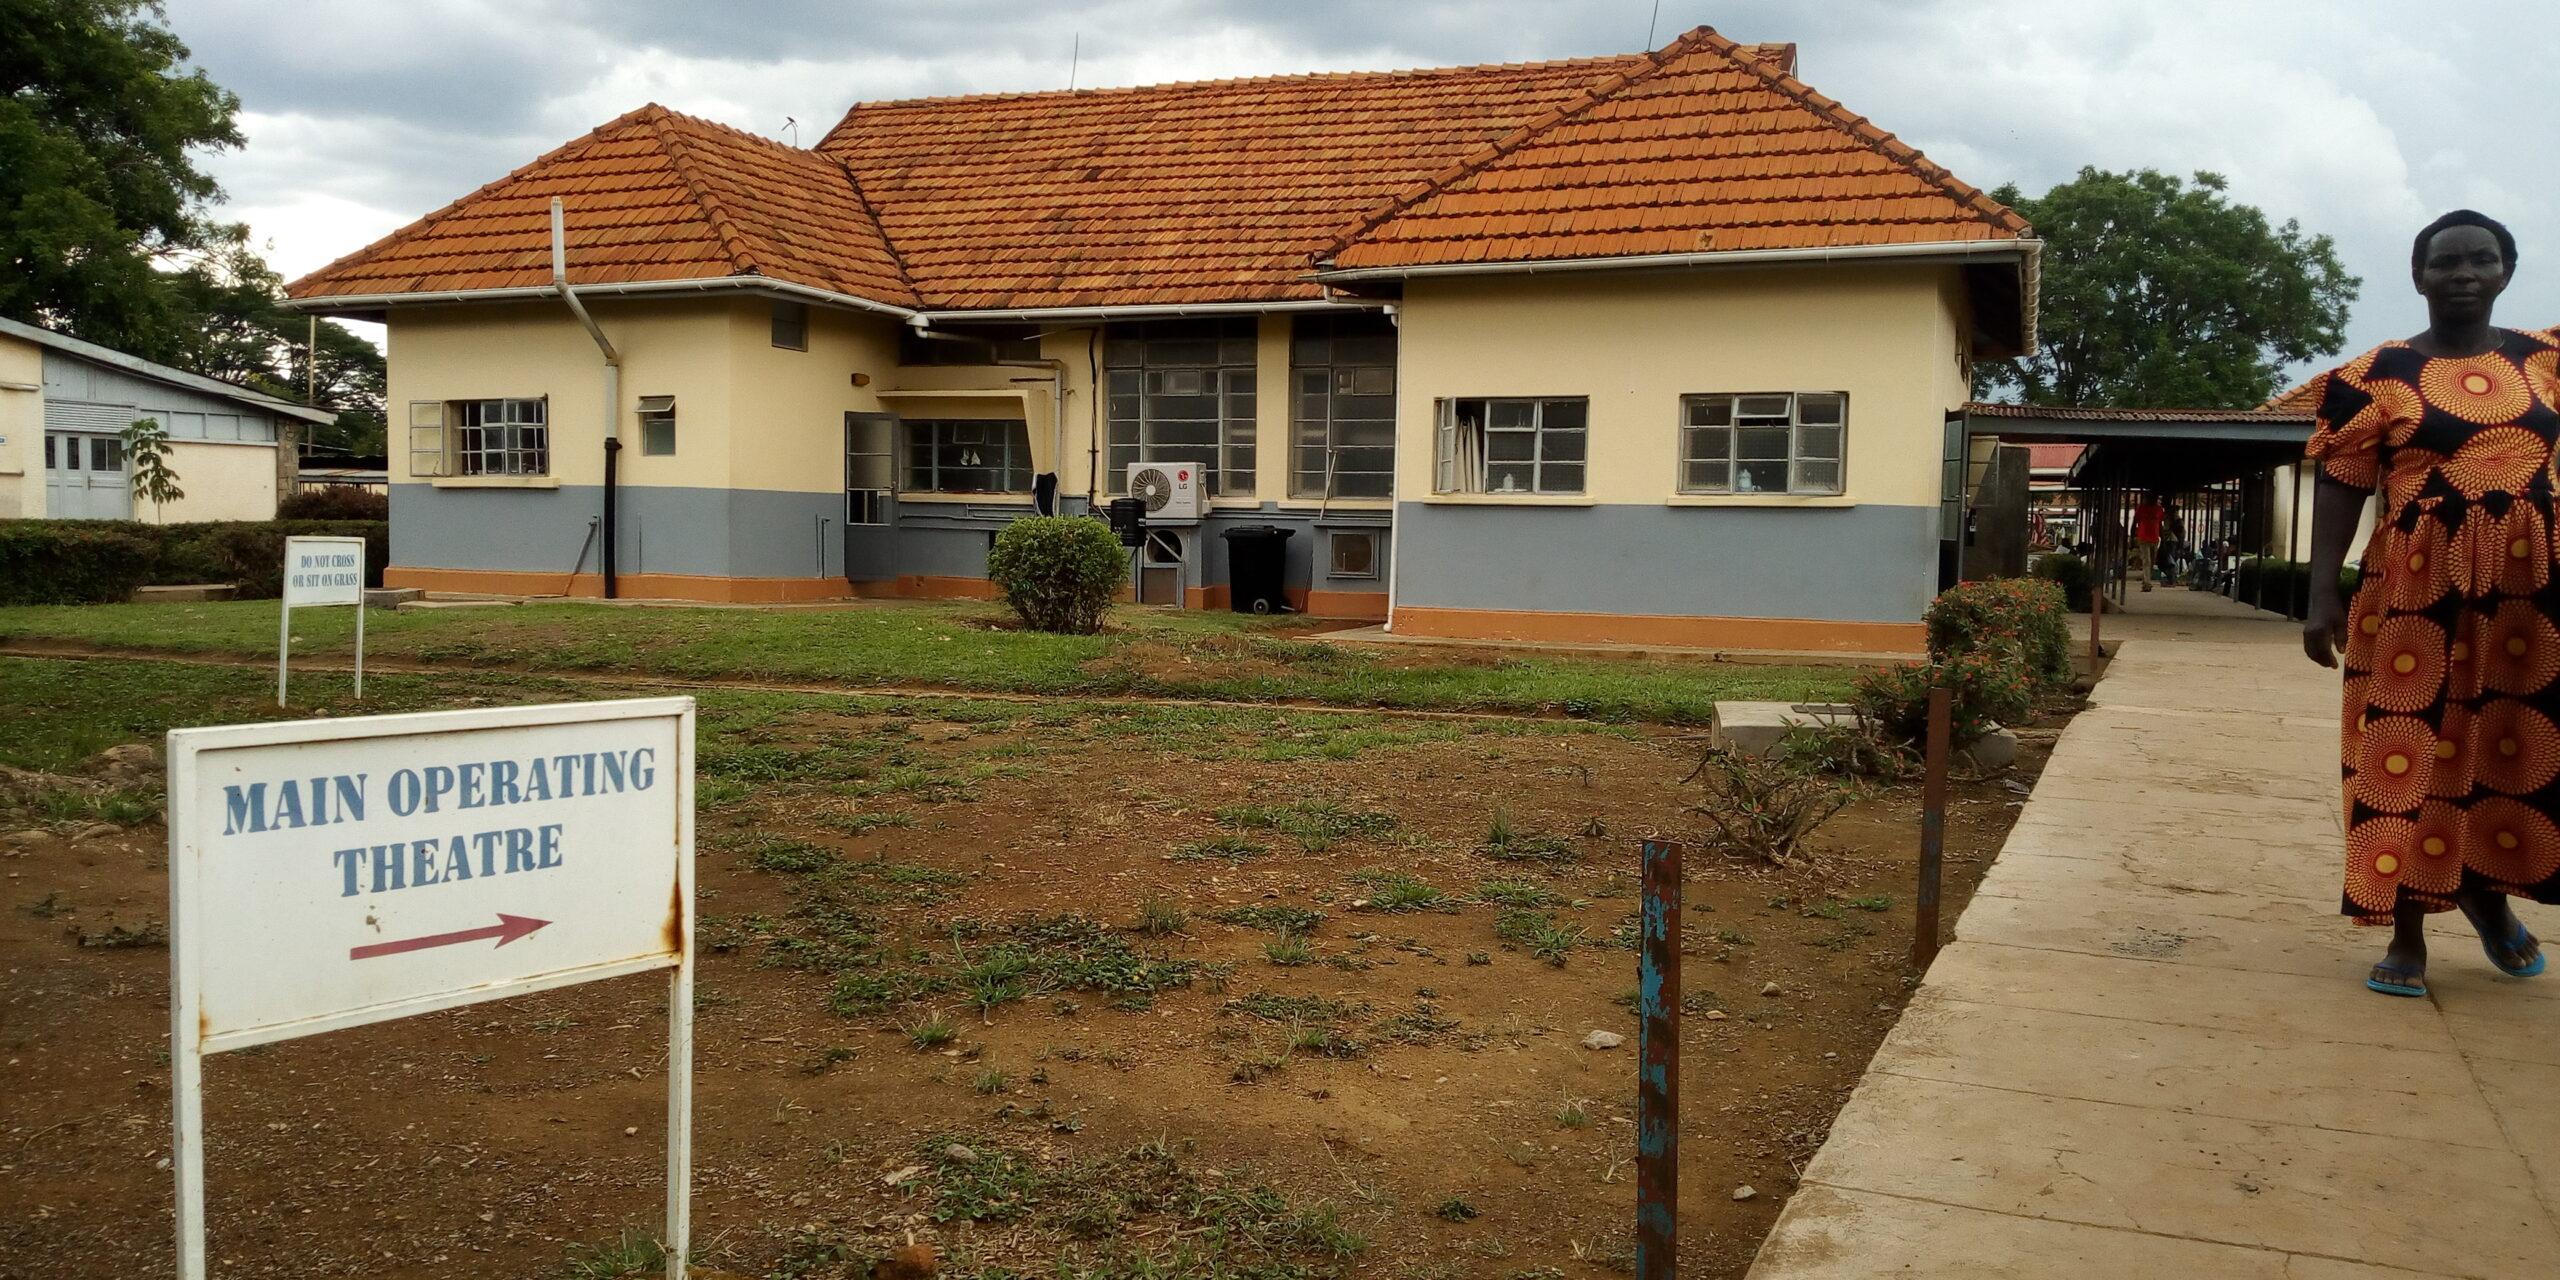 Soroti Regional Referral hospital theator building